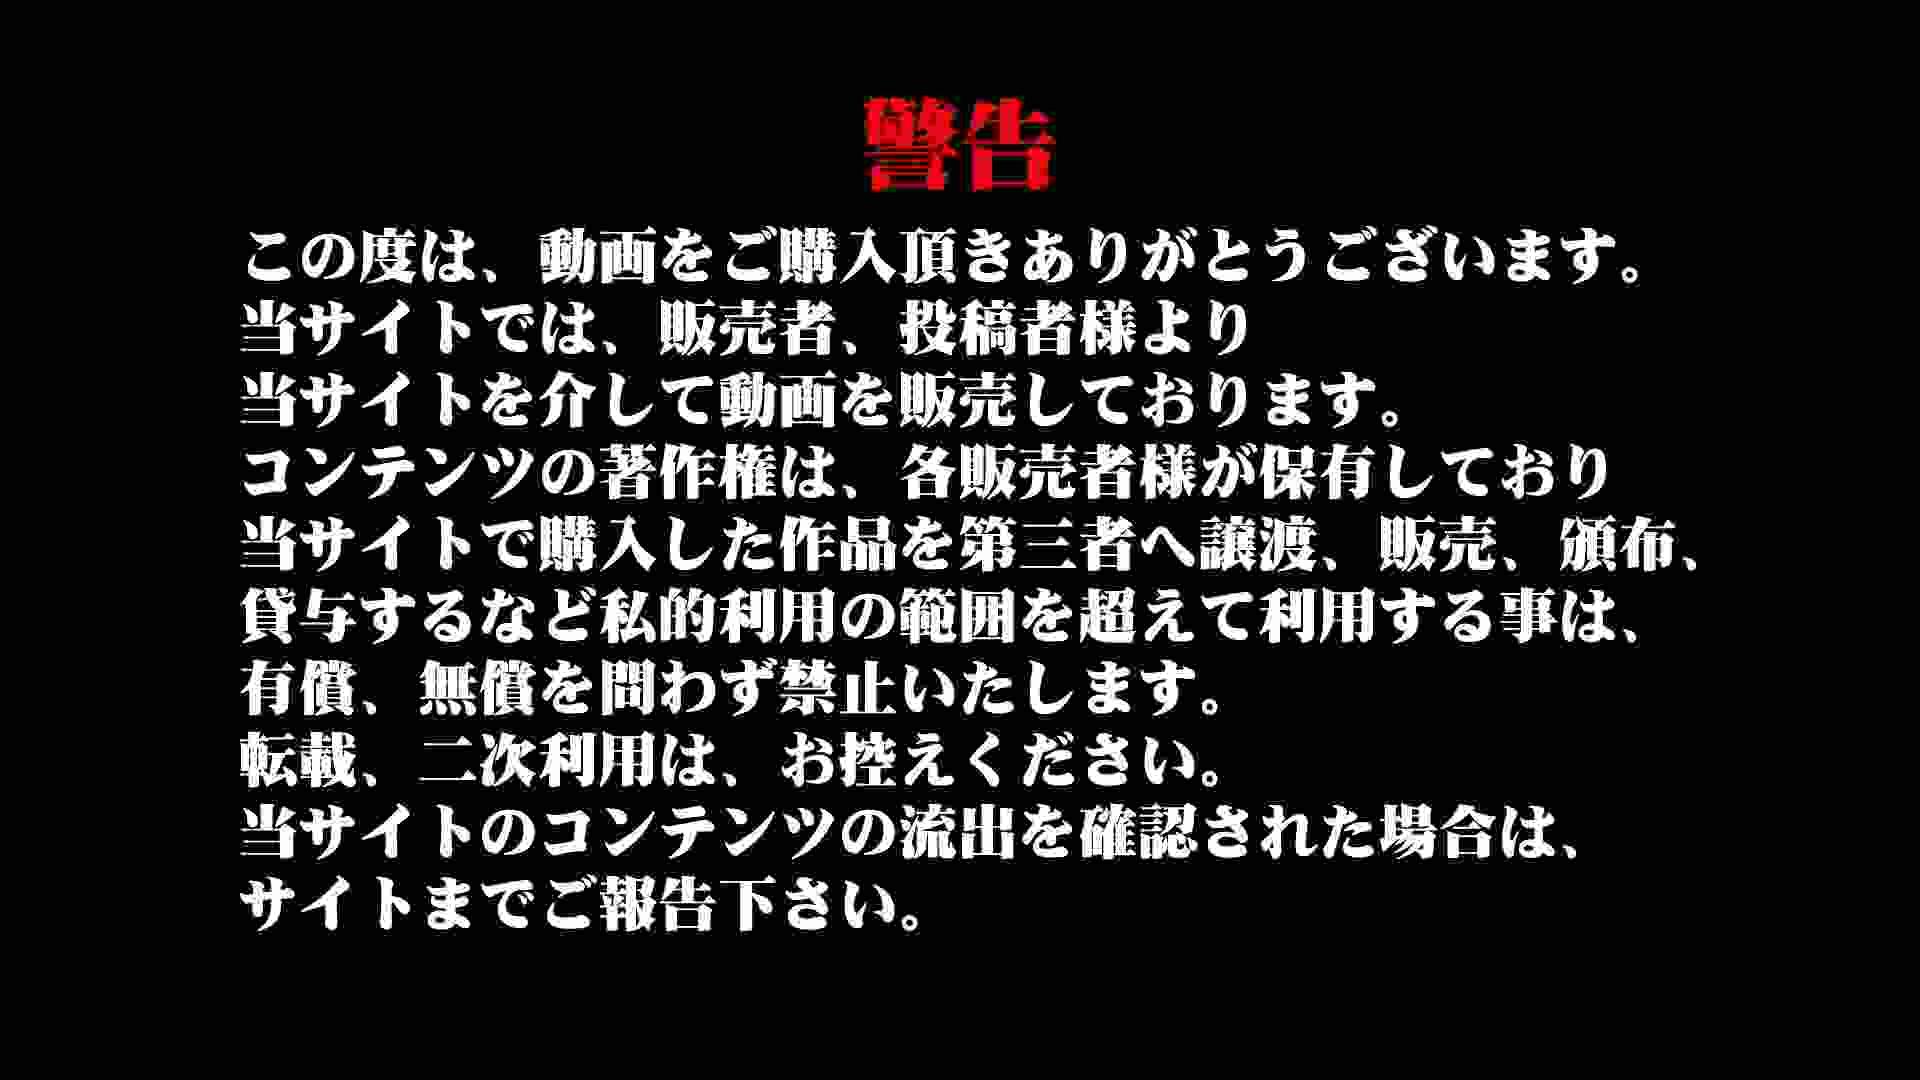 Aquaな露天風呂Vol.927 OLのプライベート  12pic 3